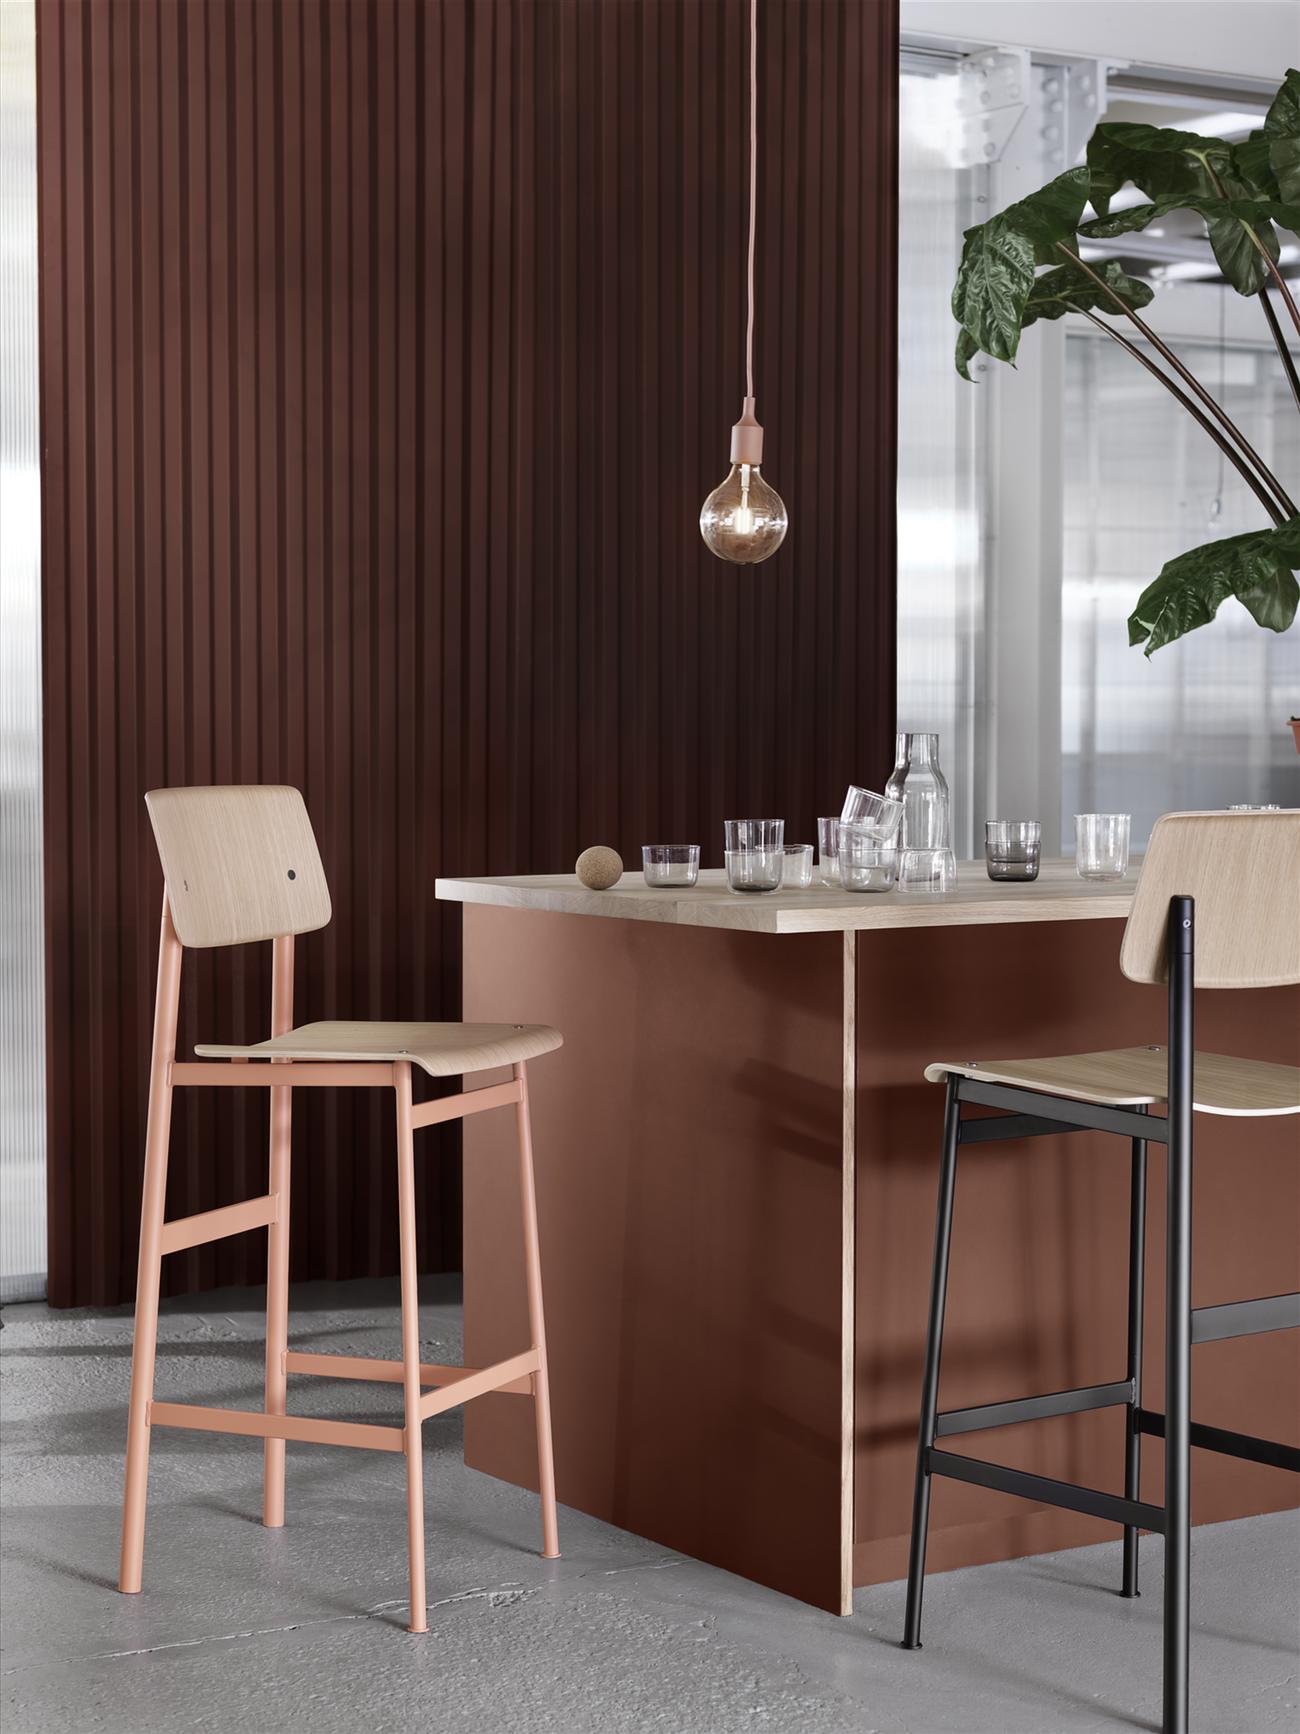 loft-bar-stool-dusty-rose-black-e27-terracotta-corky-closer-org-1512431034